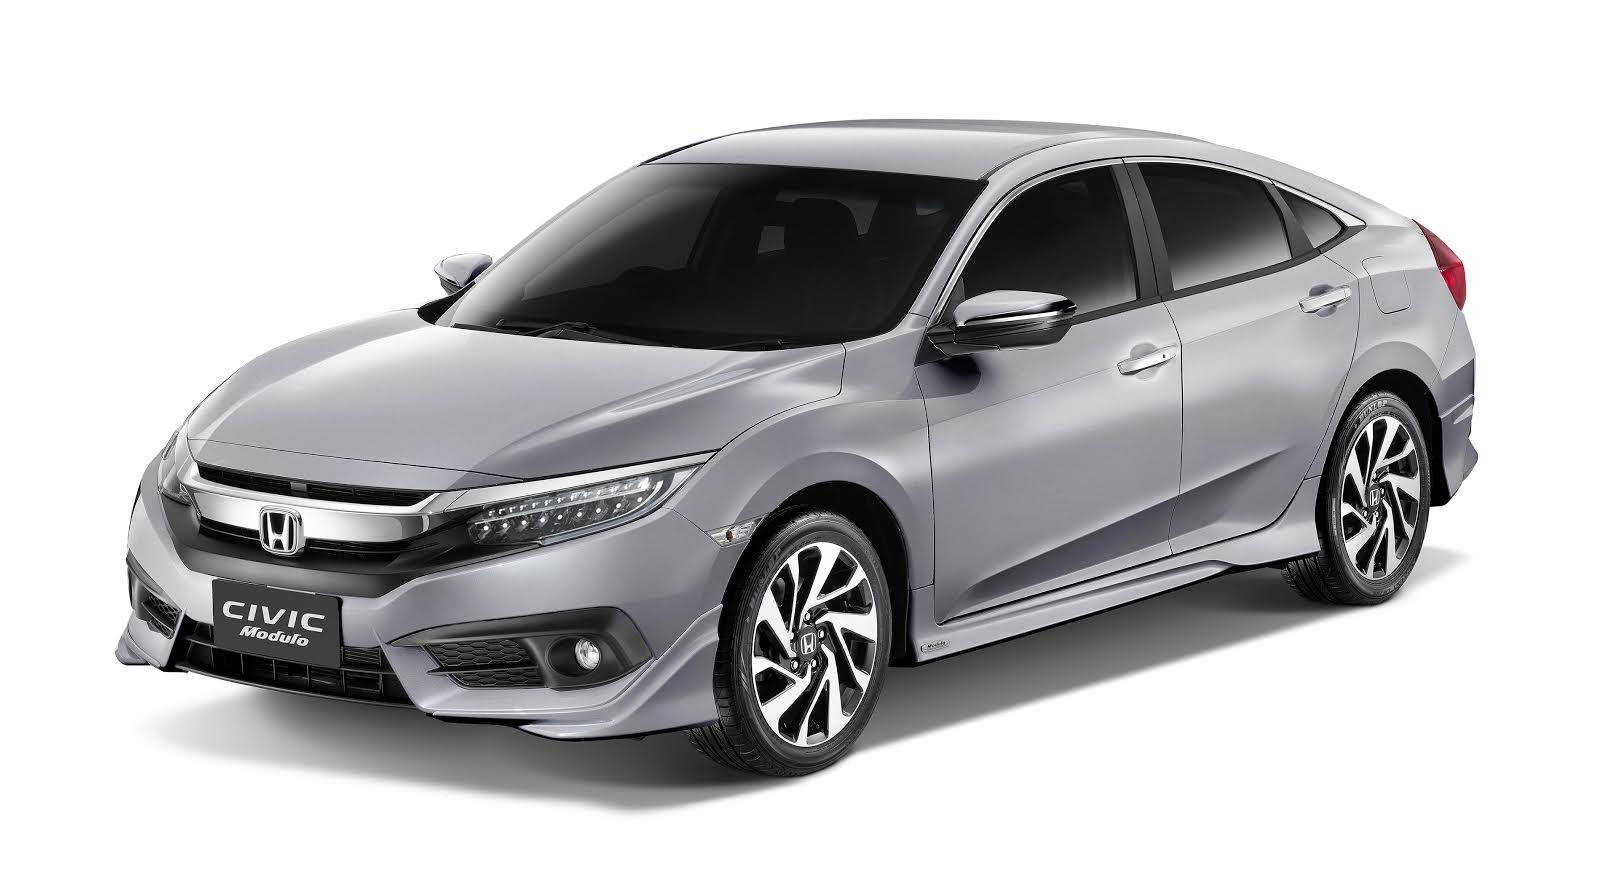 Honda Civic: Honda Civic RS Turbo Modulo Launched With Body Kit